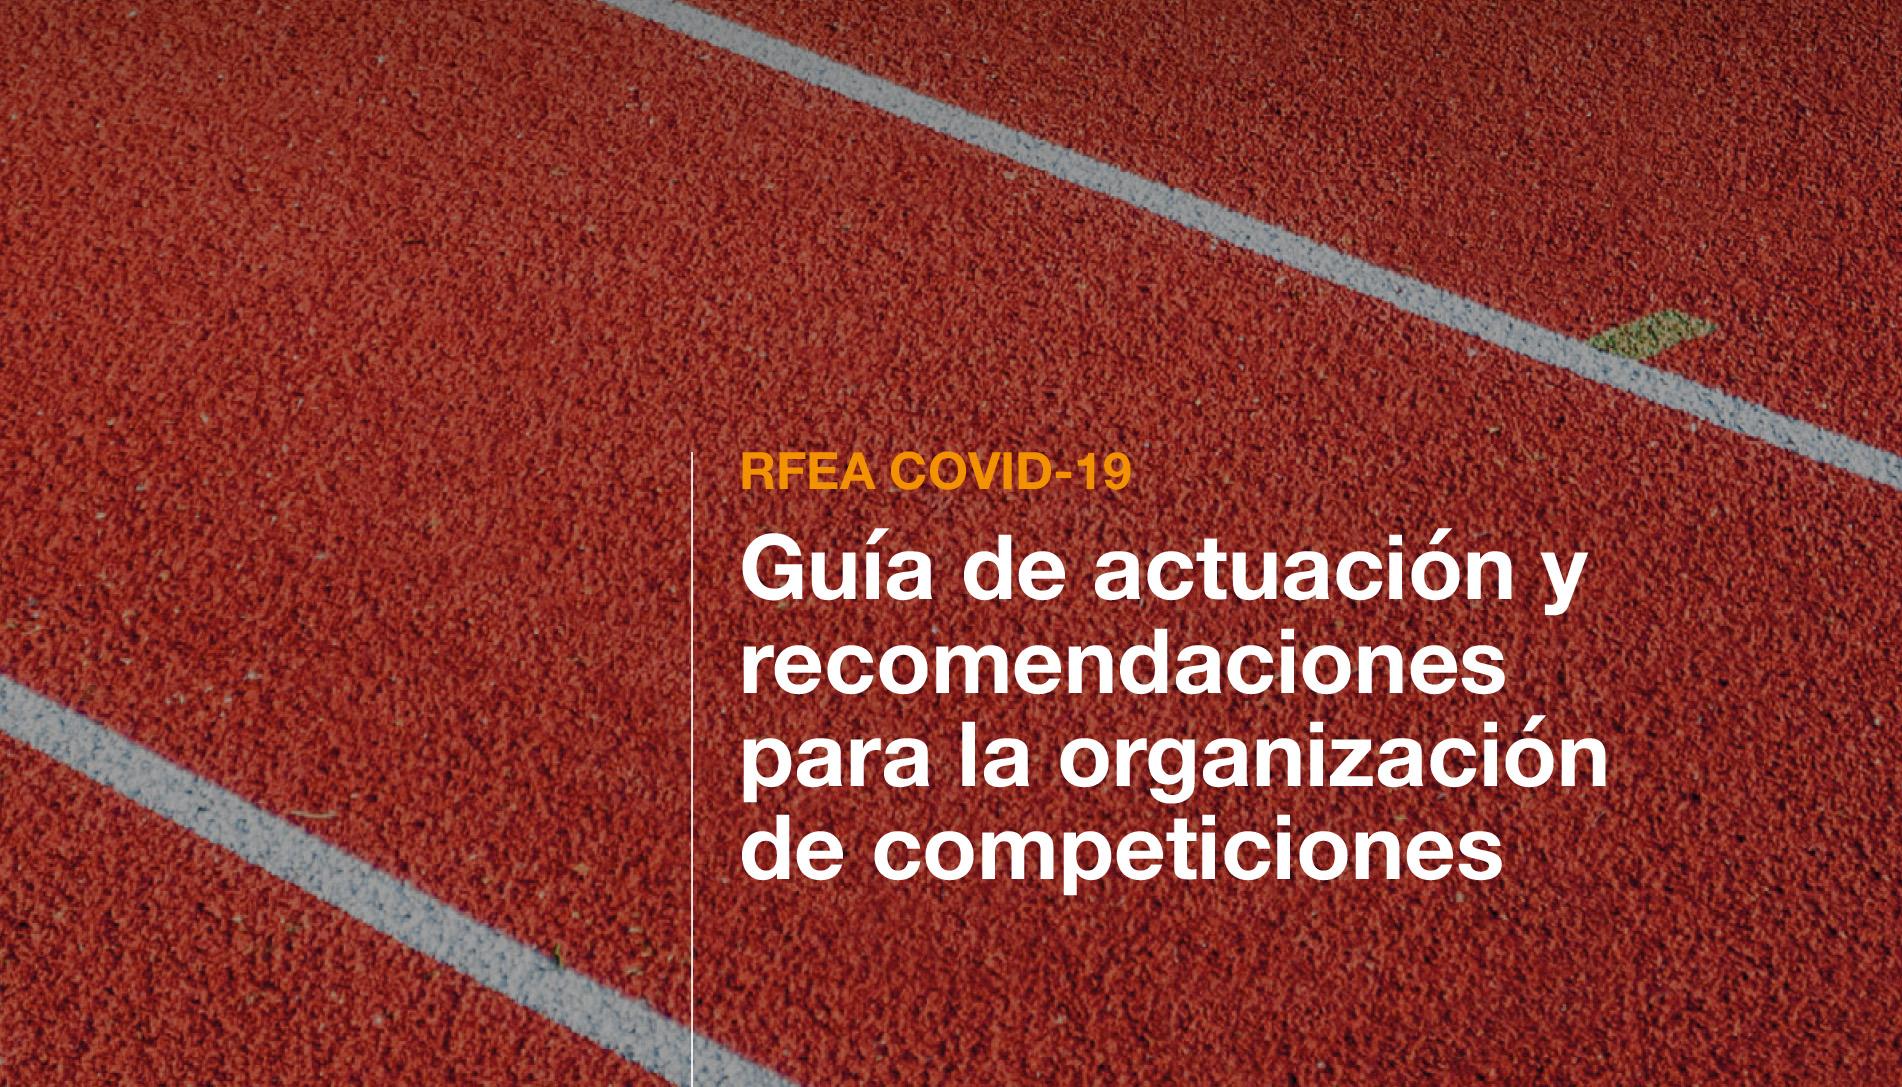 GUIA RECOMENDACIONES RFEA COVID ORGANIZACION COMPETICIONES